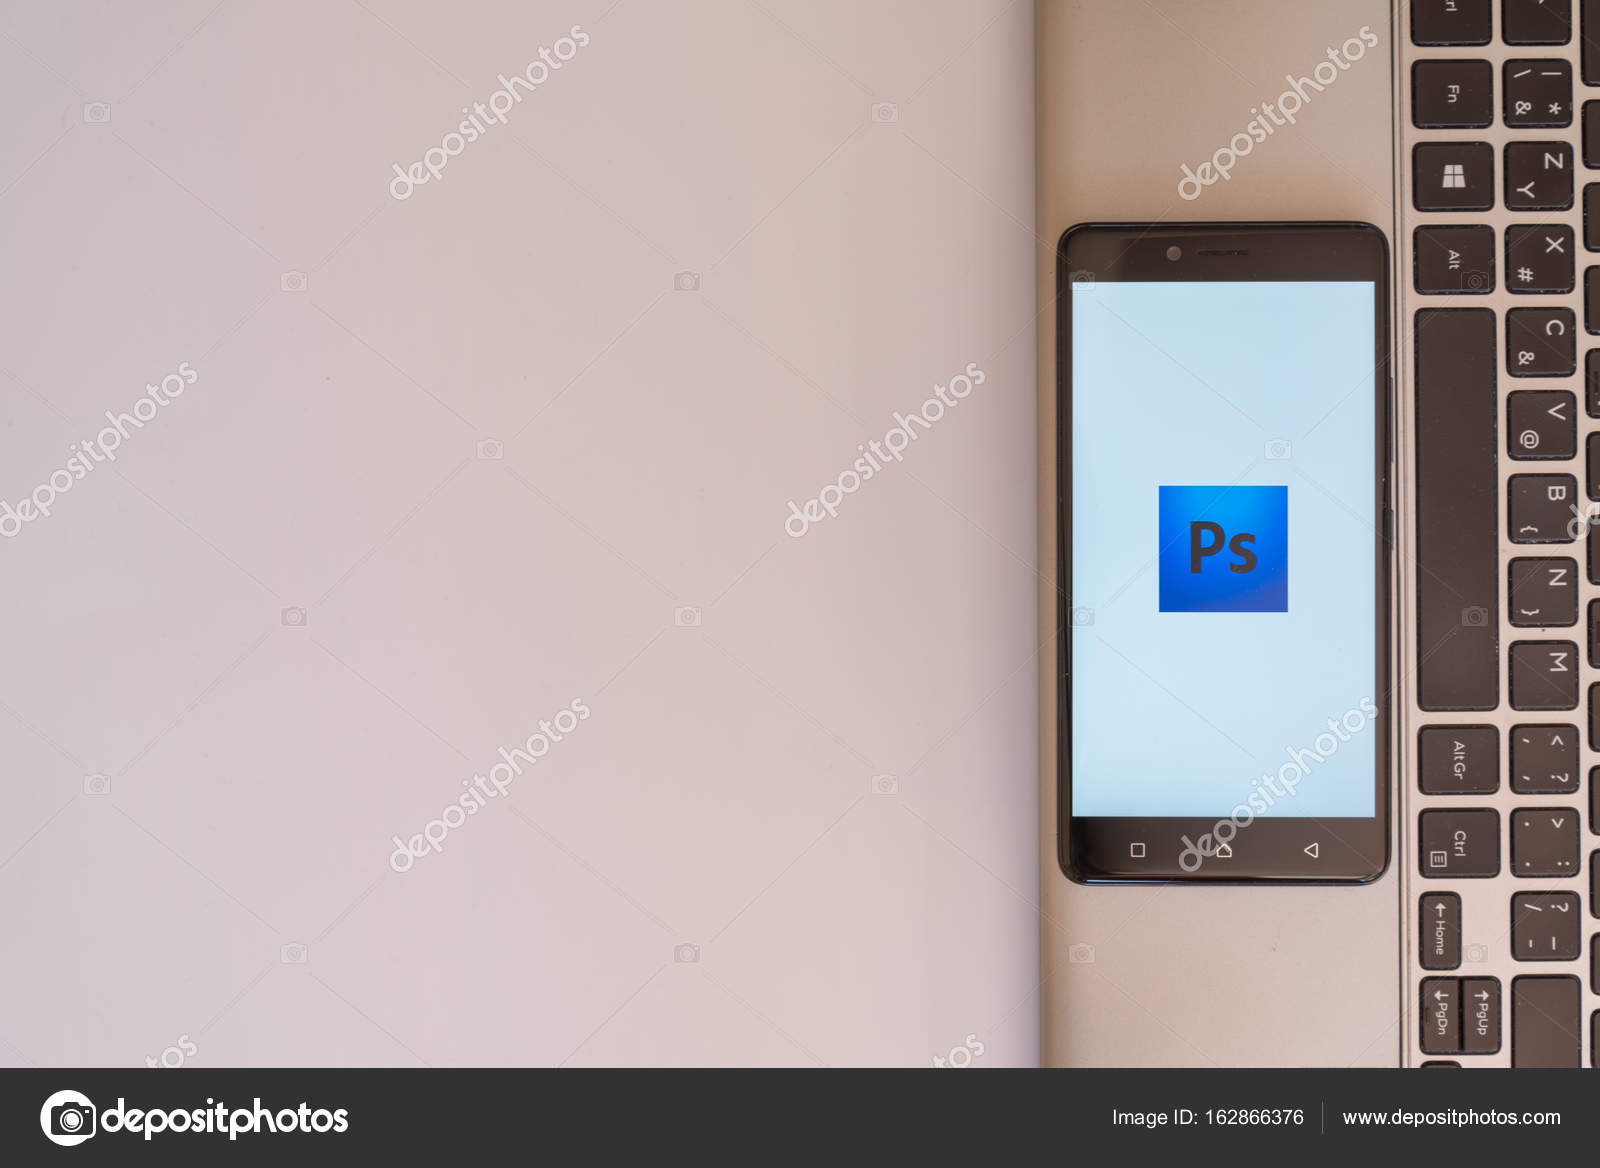 Adobe photoshop logo on smartphone – Stock Editorial Photo